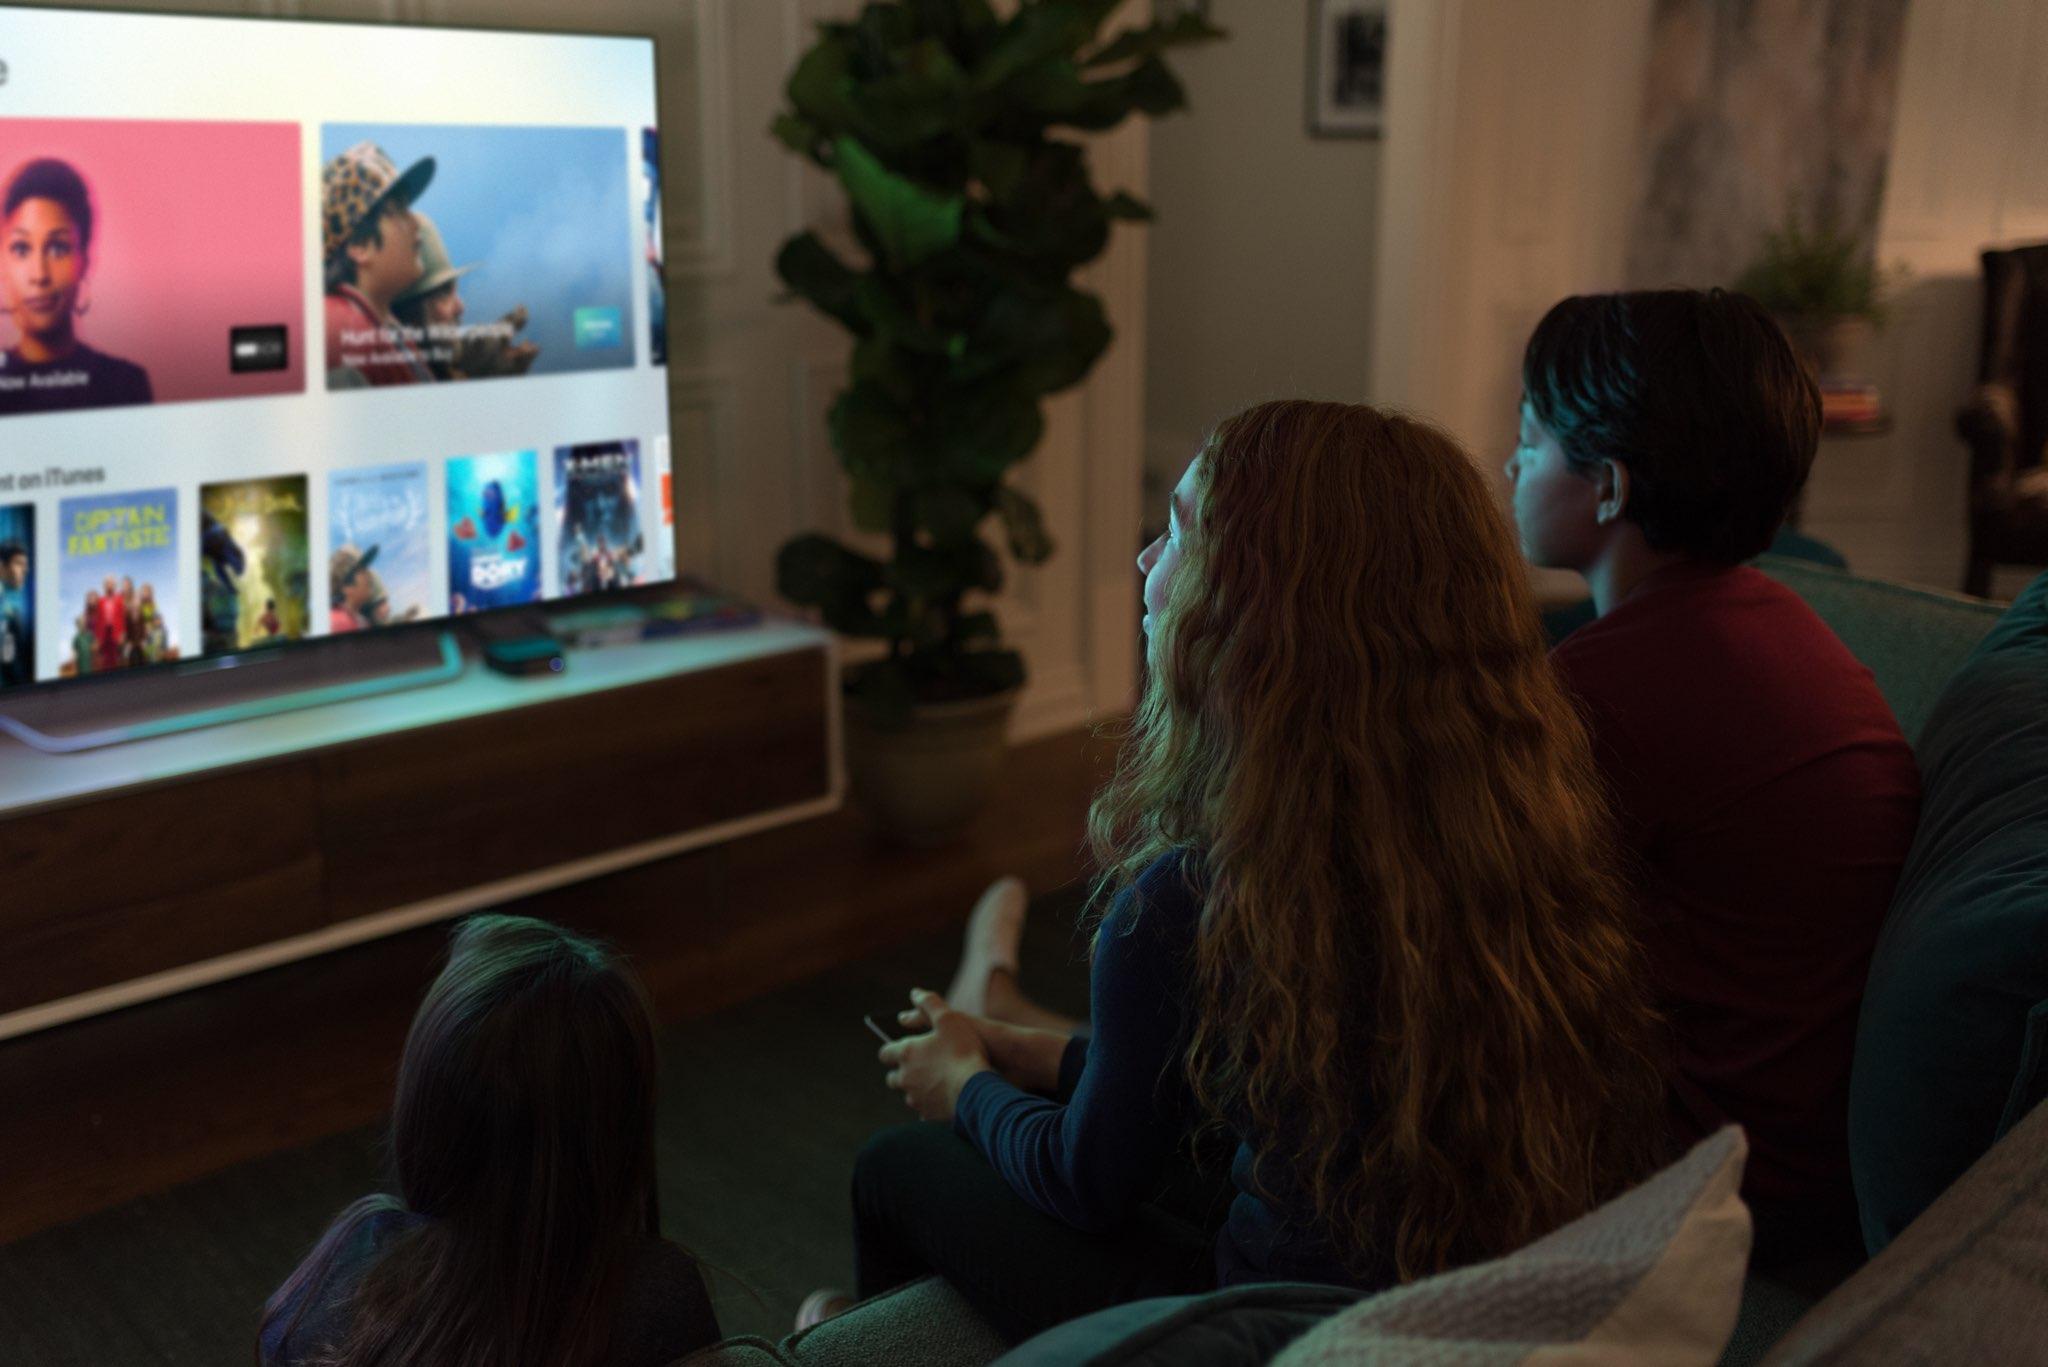 Apple TV features tvOS 14 - hero image